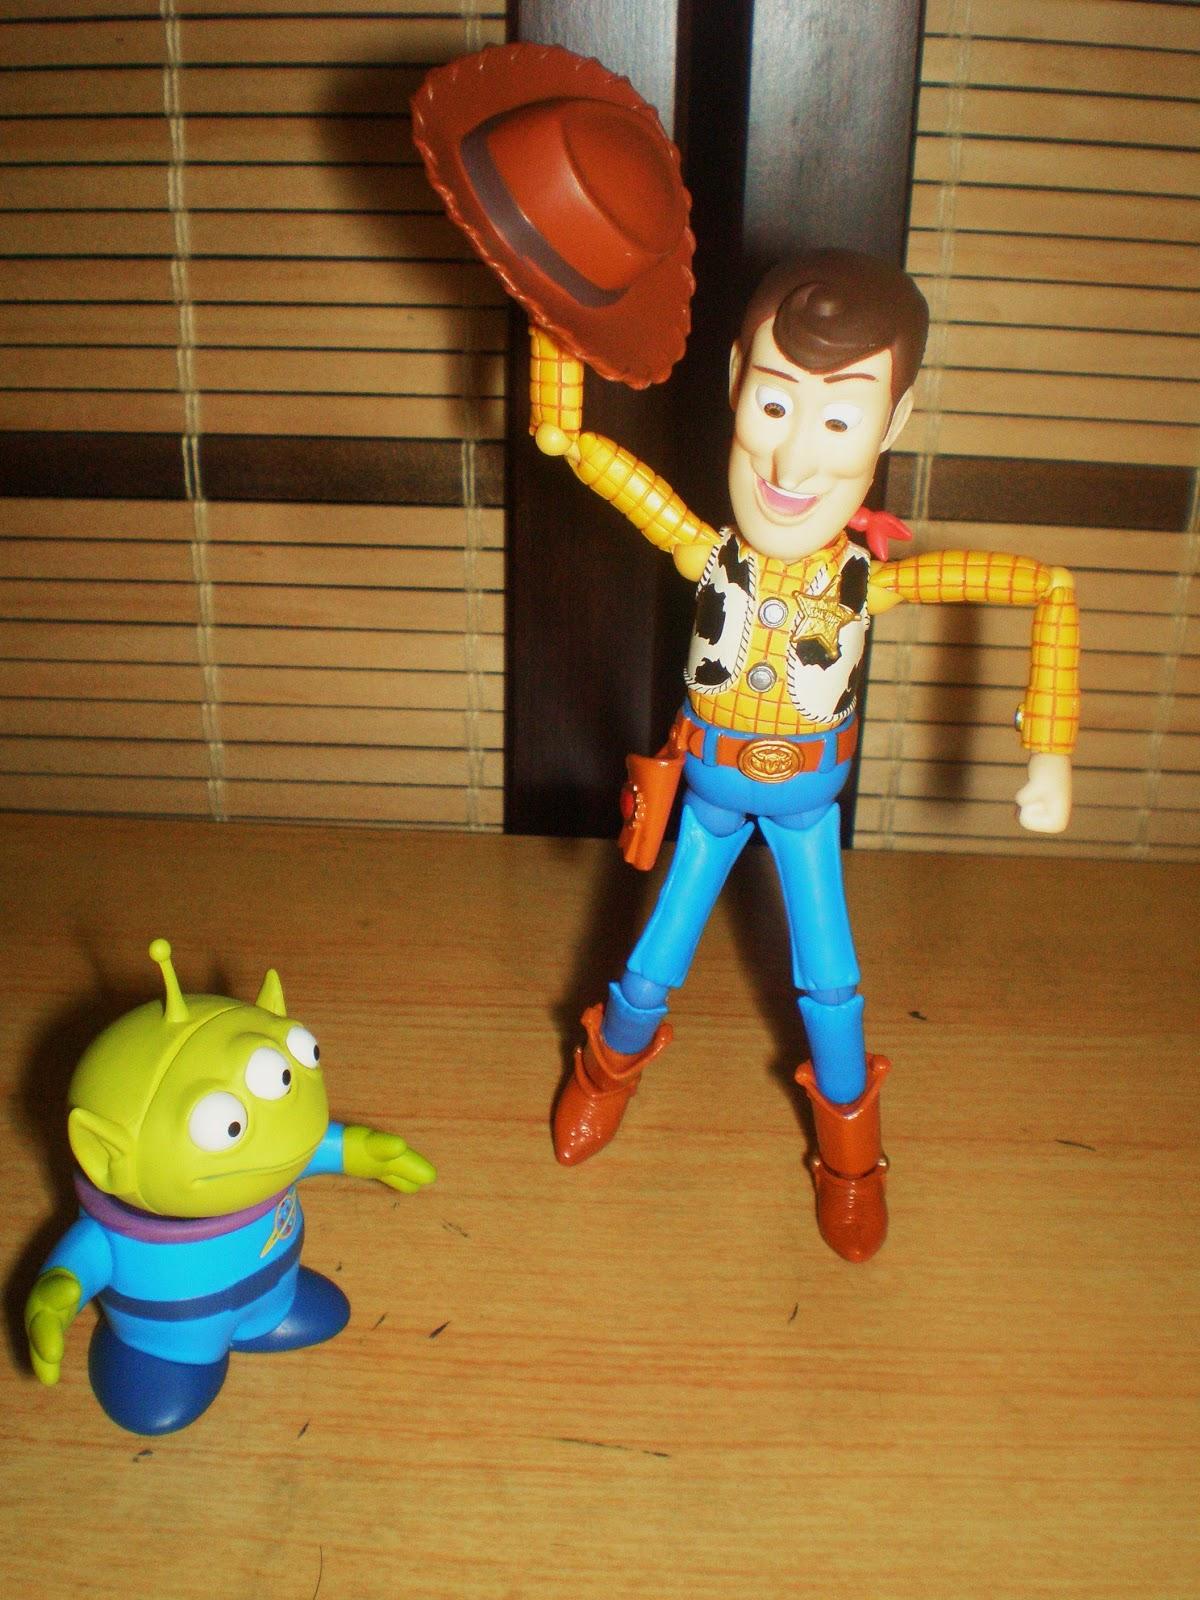 Angels and Summer: Kaiyodo Revoltech - Pixar Figure ...